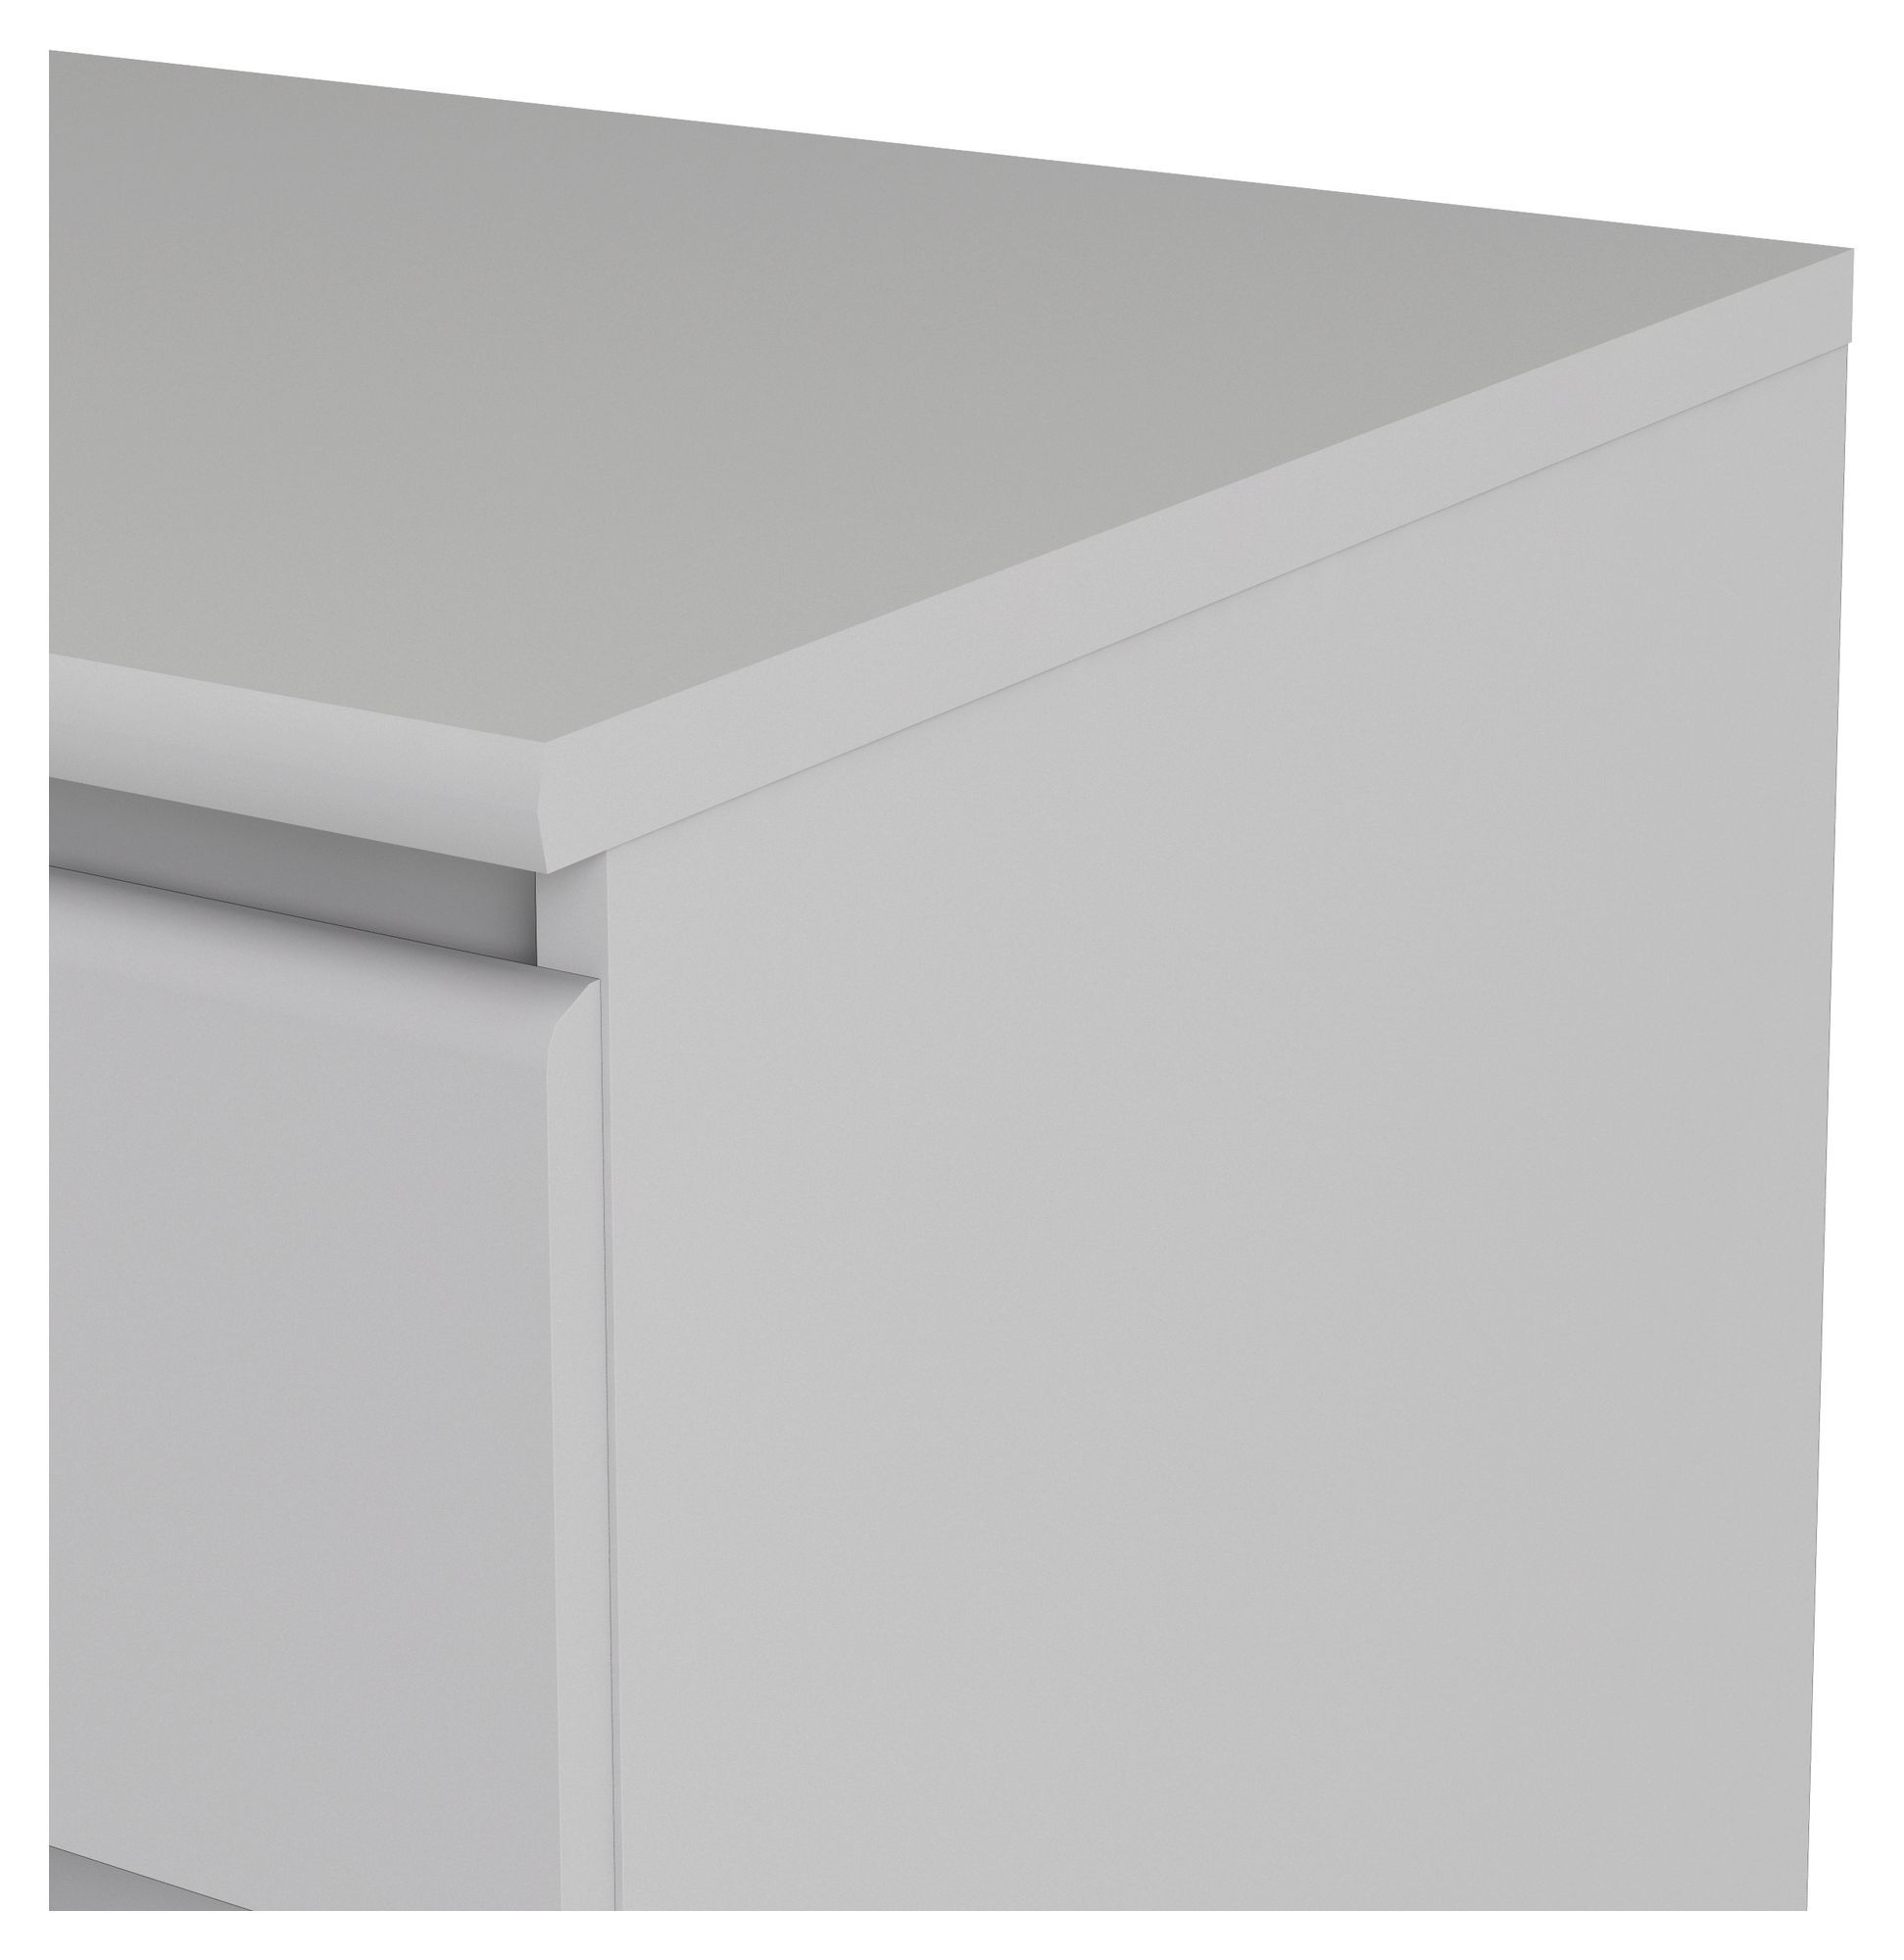 Naia Kommode - Hvid m/6 skuffer - Hvid kommode med 6 skuffer